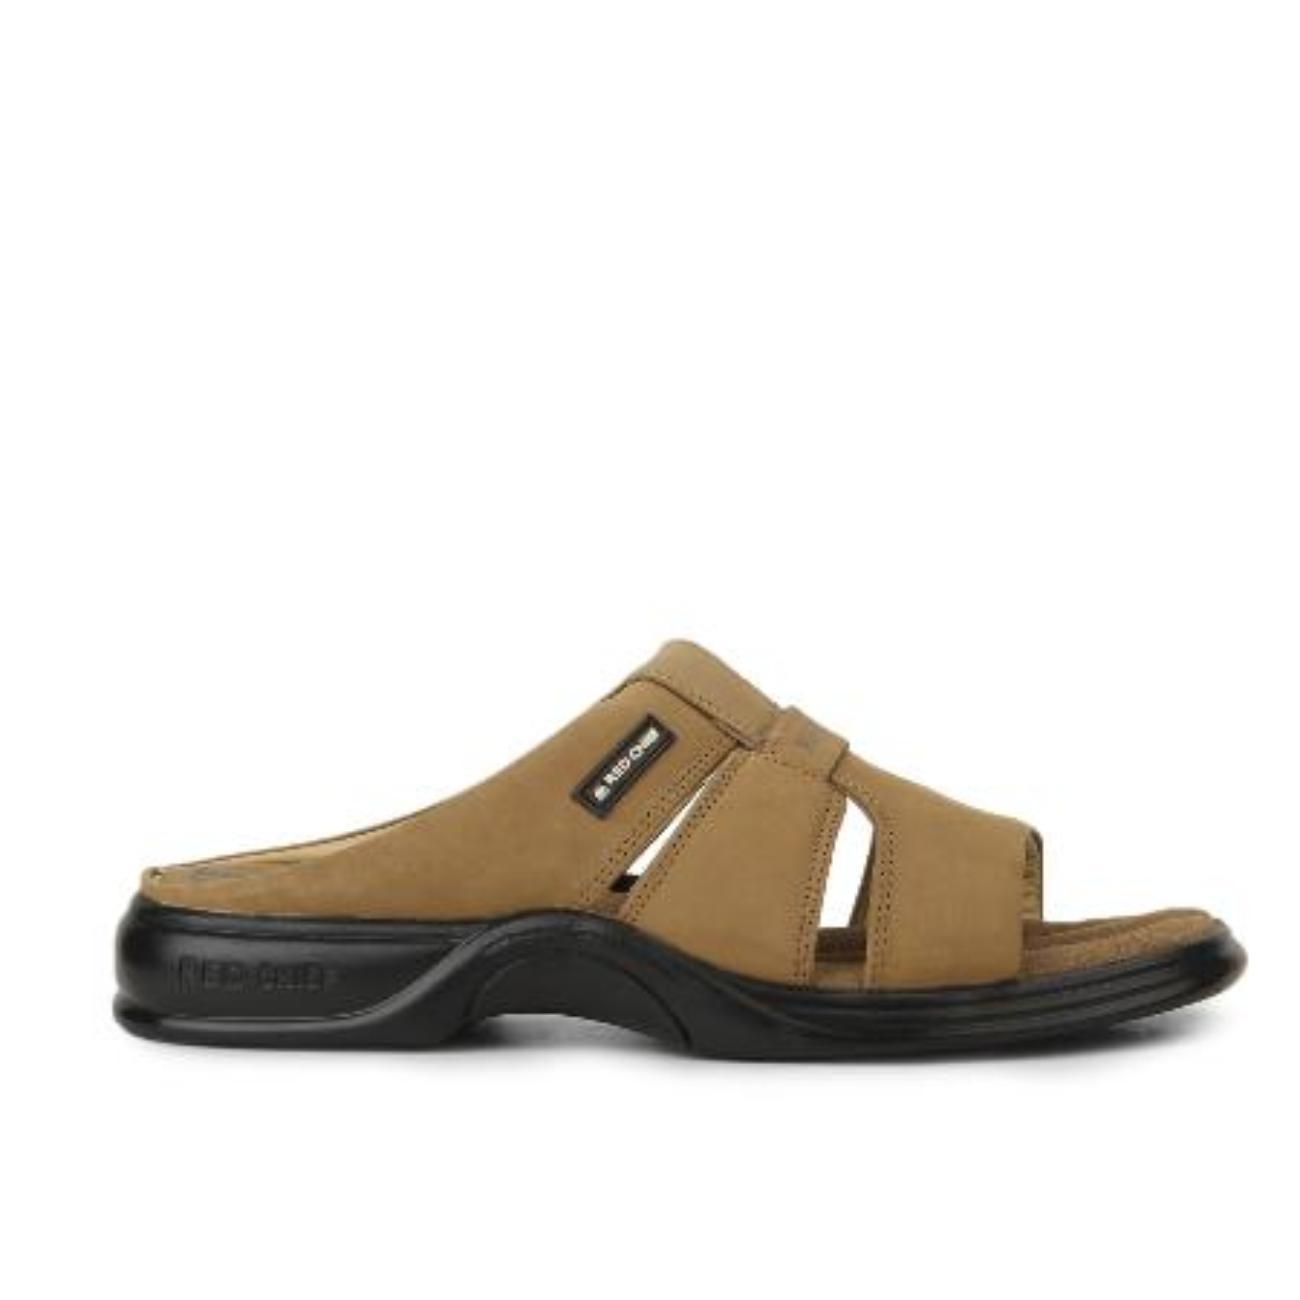 buy rust slip-on slippers side view_1